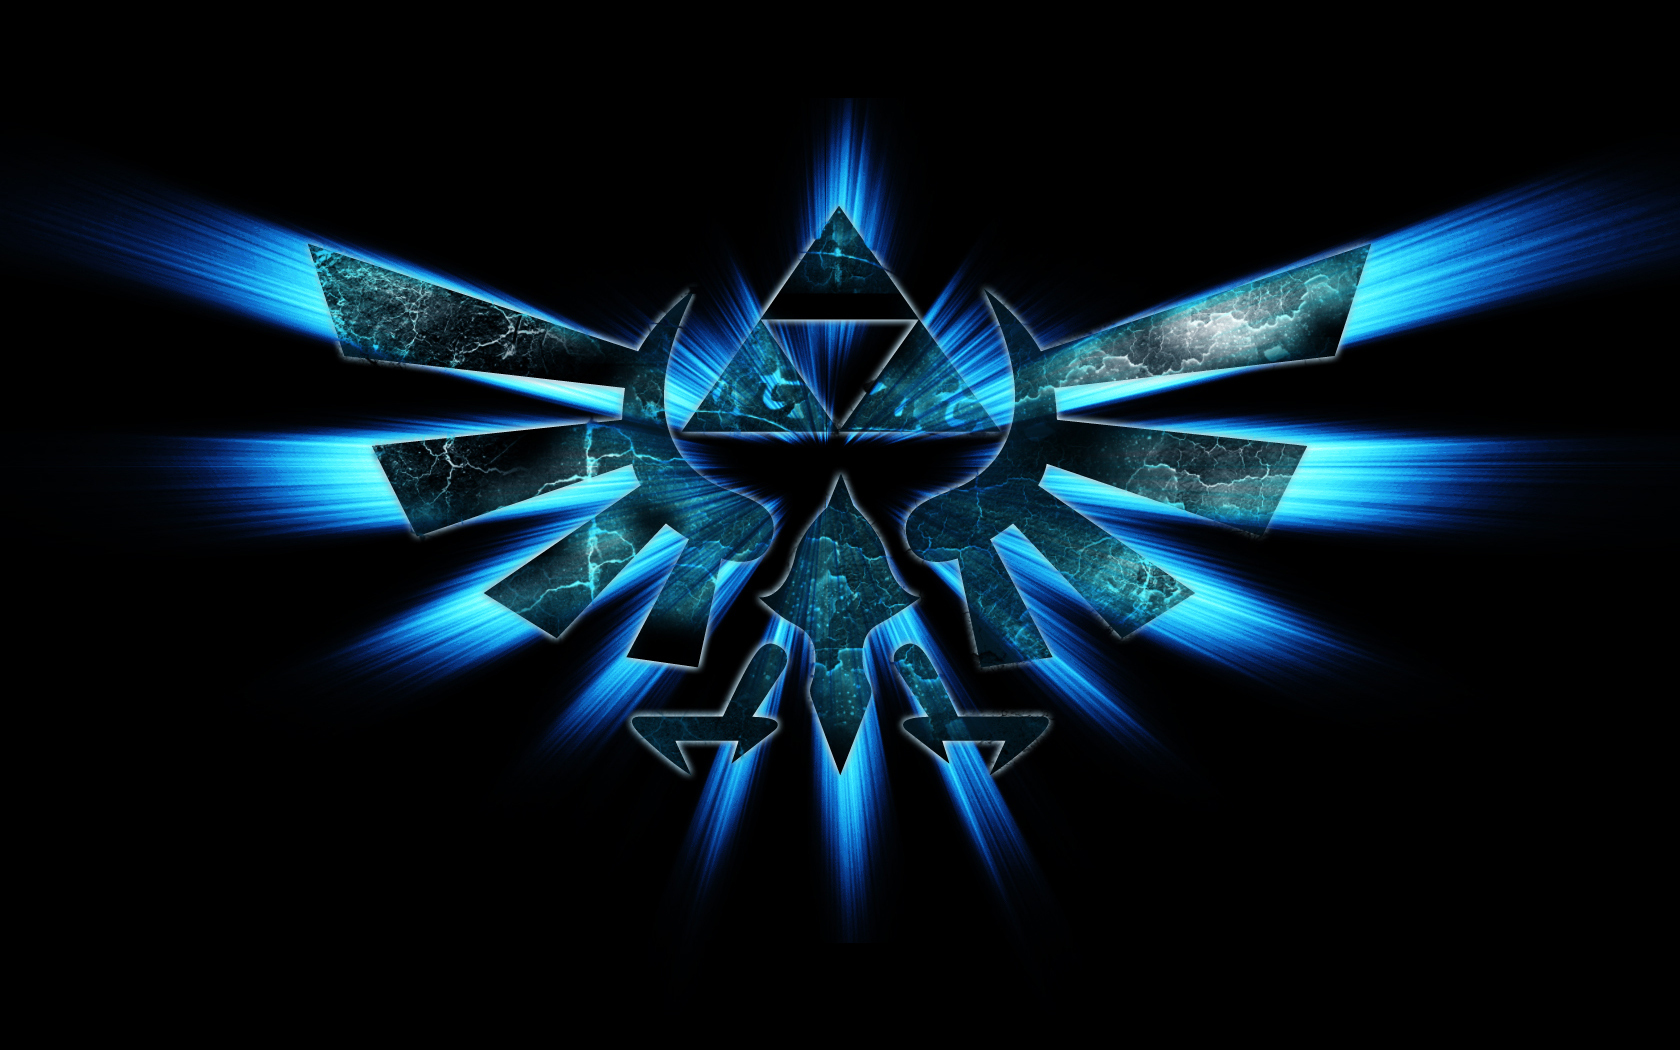 Zelda Wallpaper Hd 68706 1680x1050